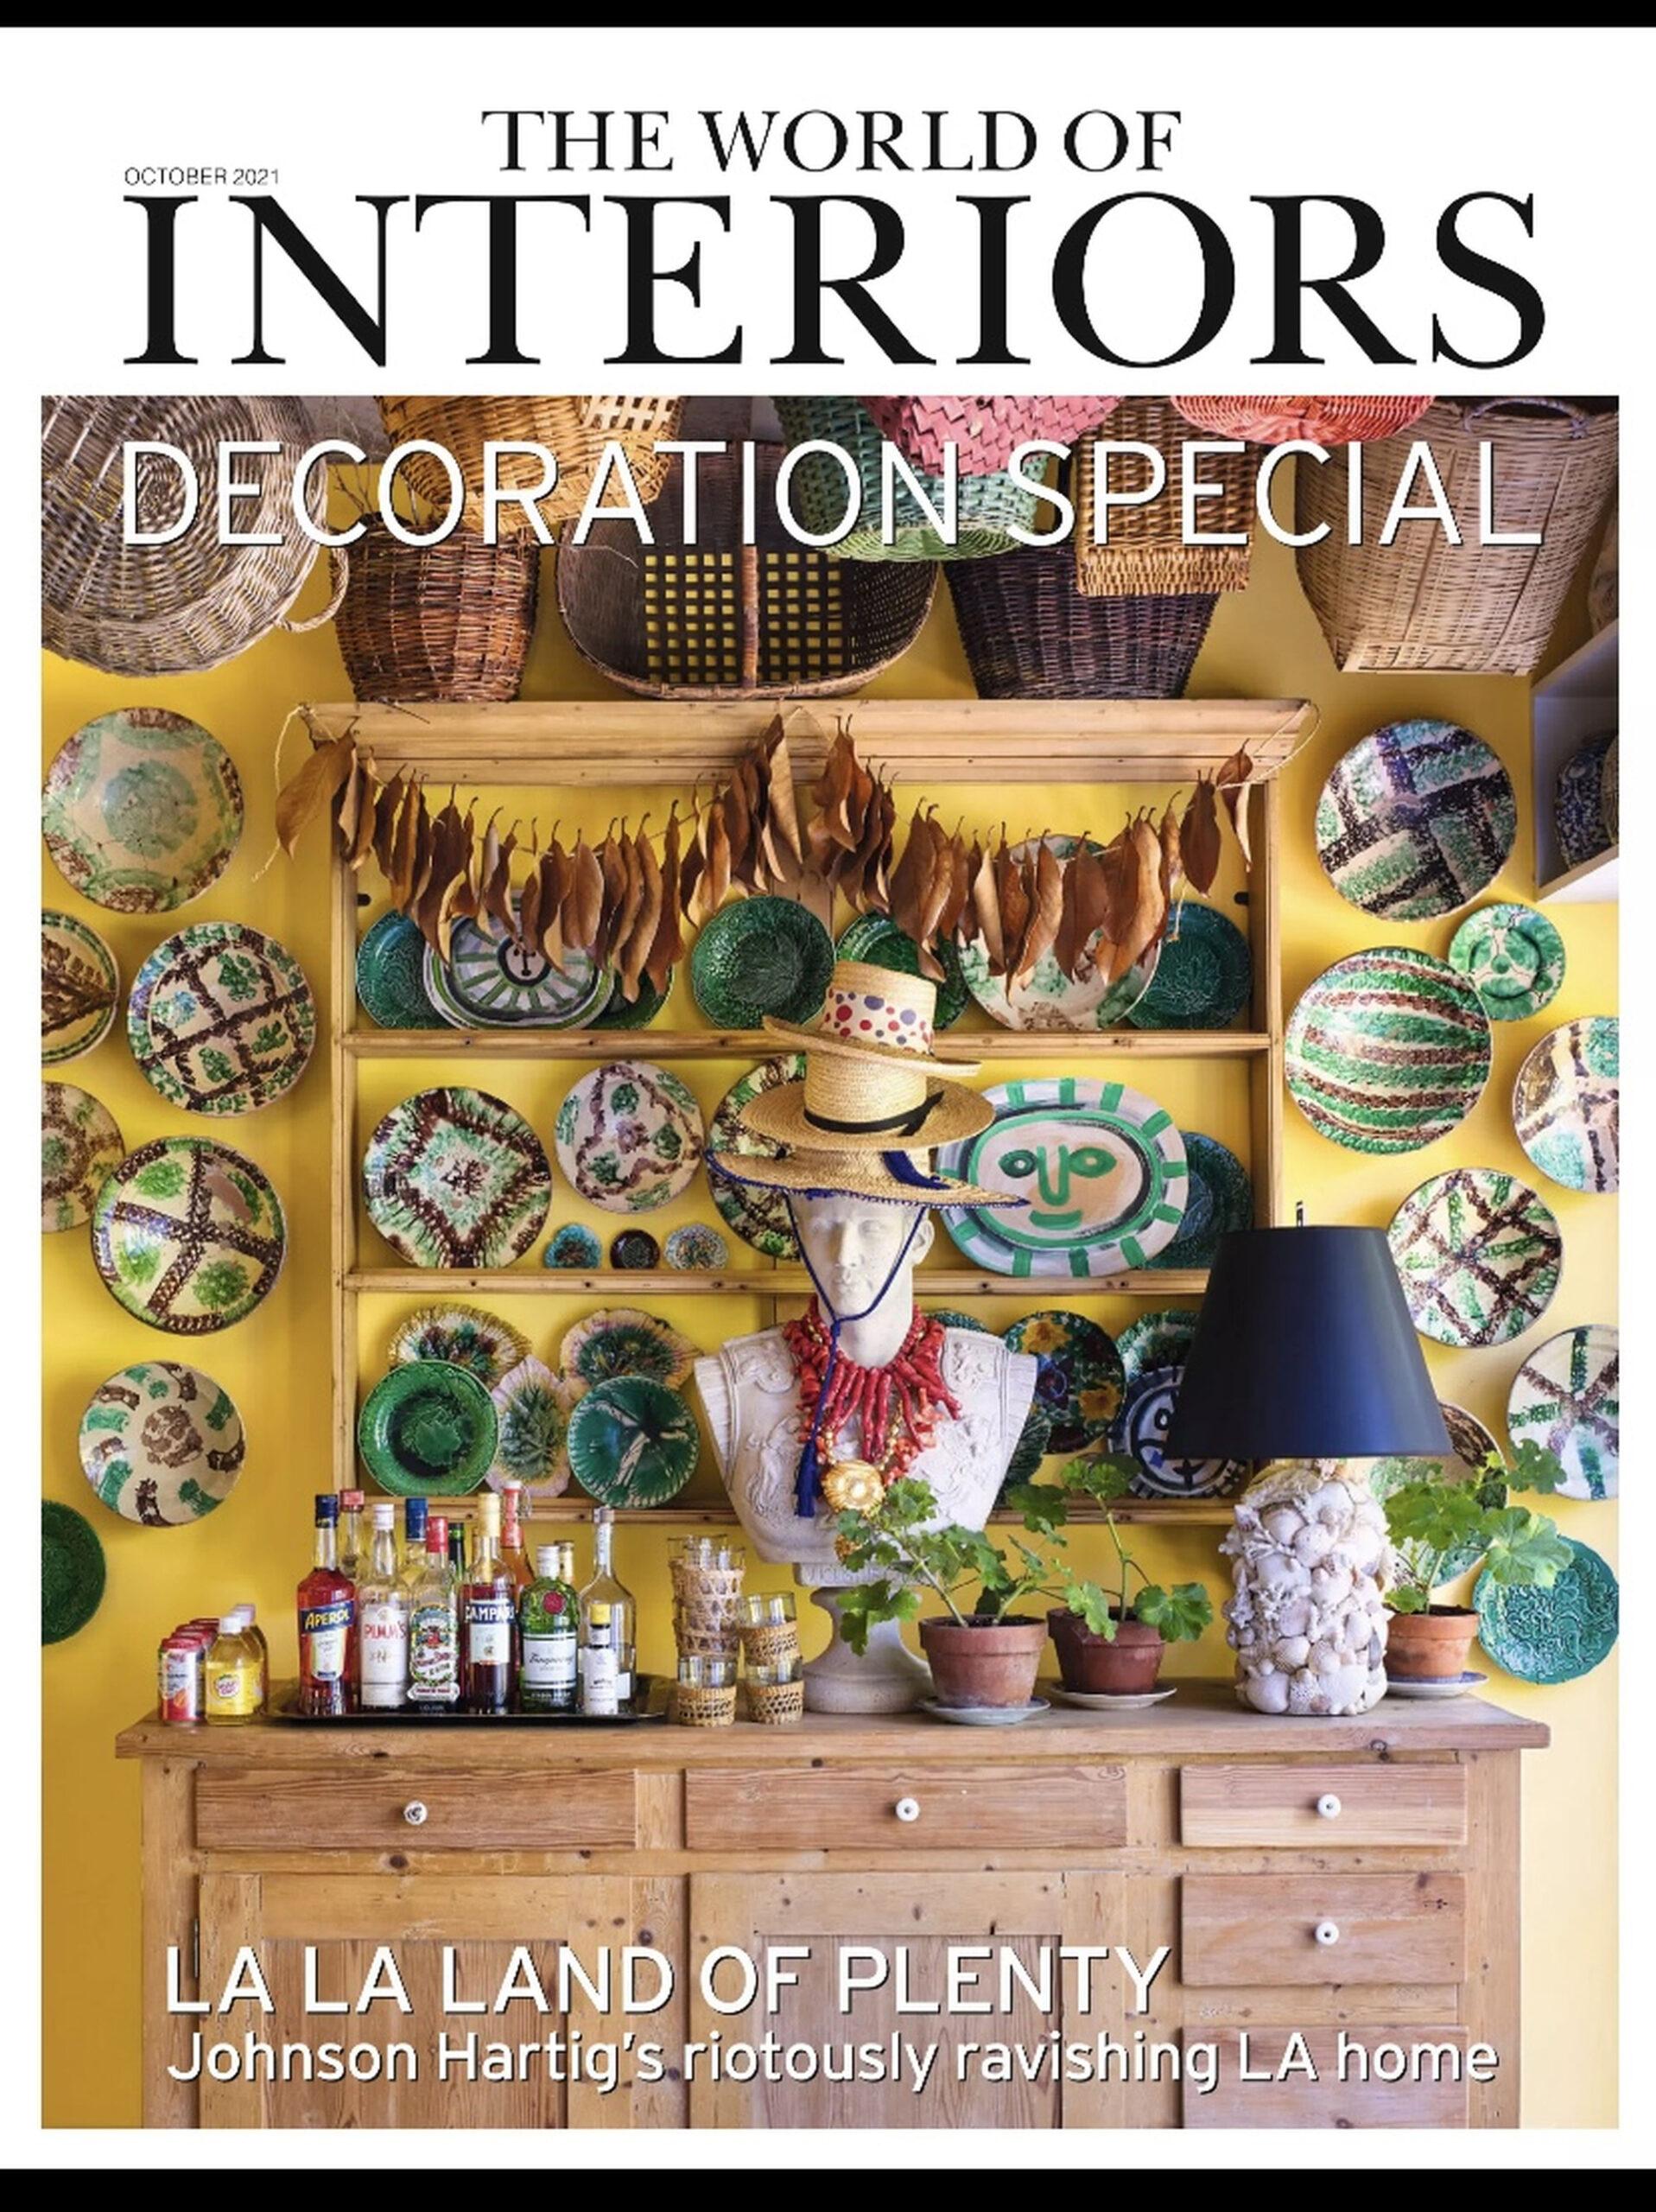 World of Interiors, October 2021